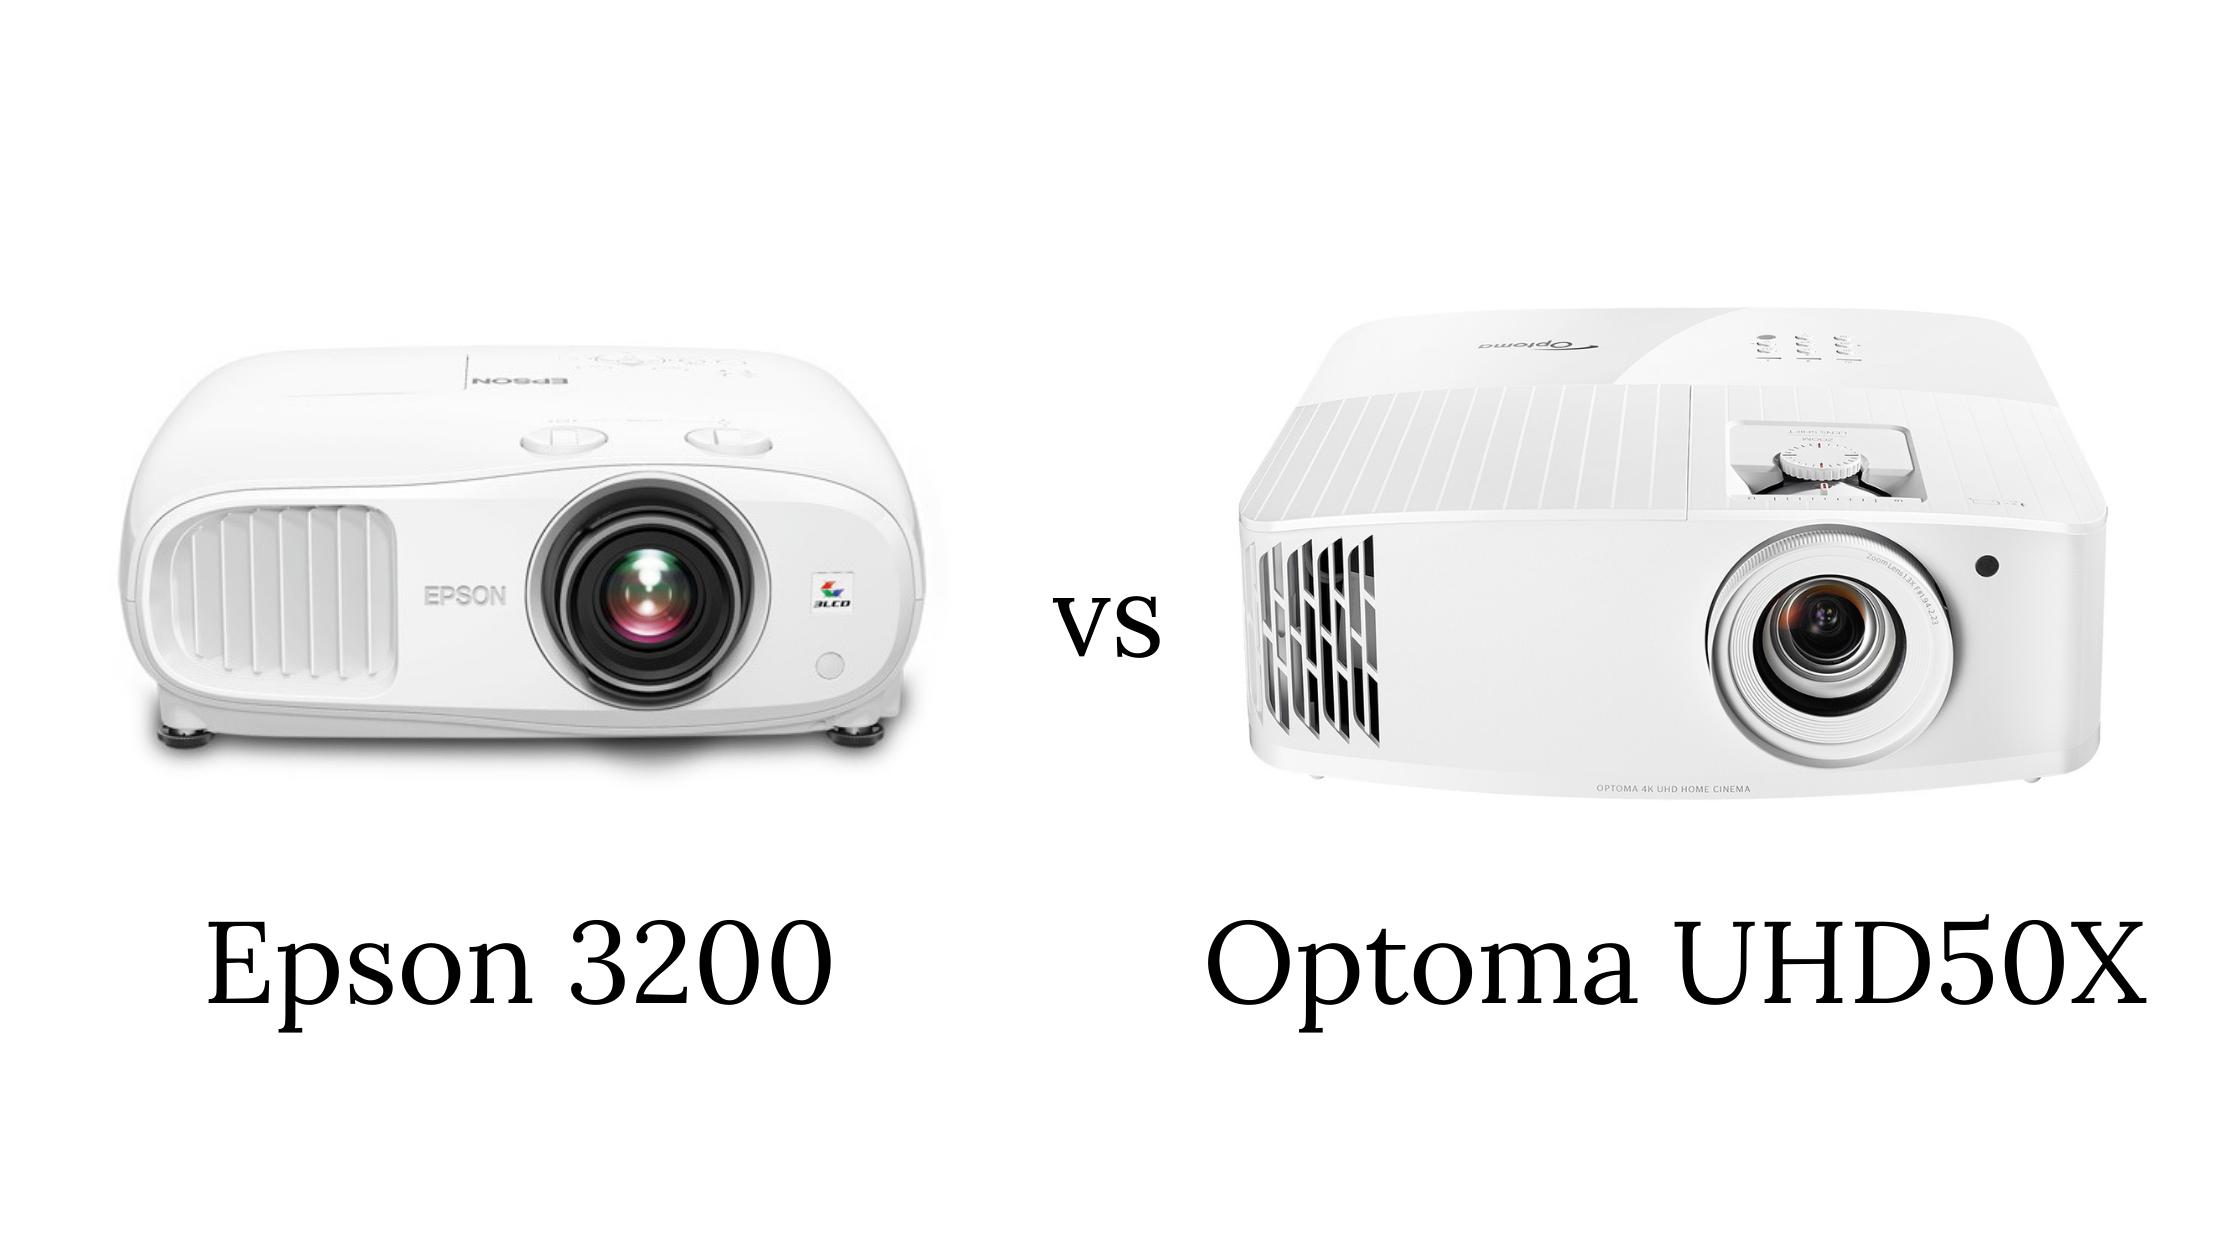 Epson 3200 vs Optoma UHD50X